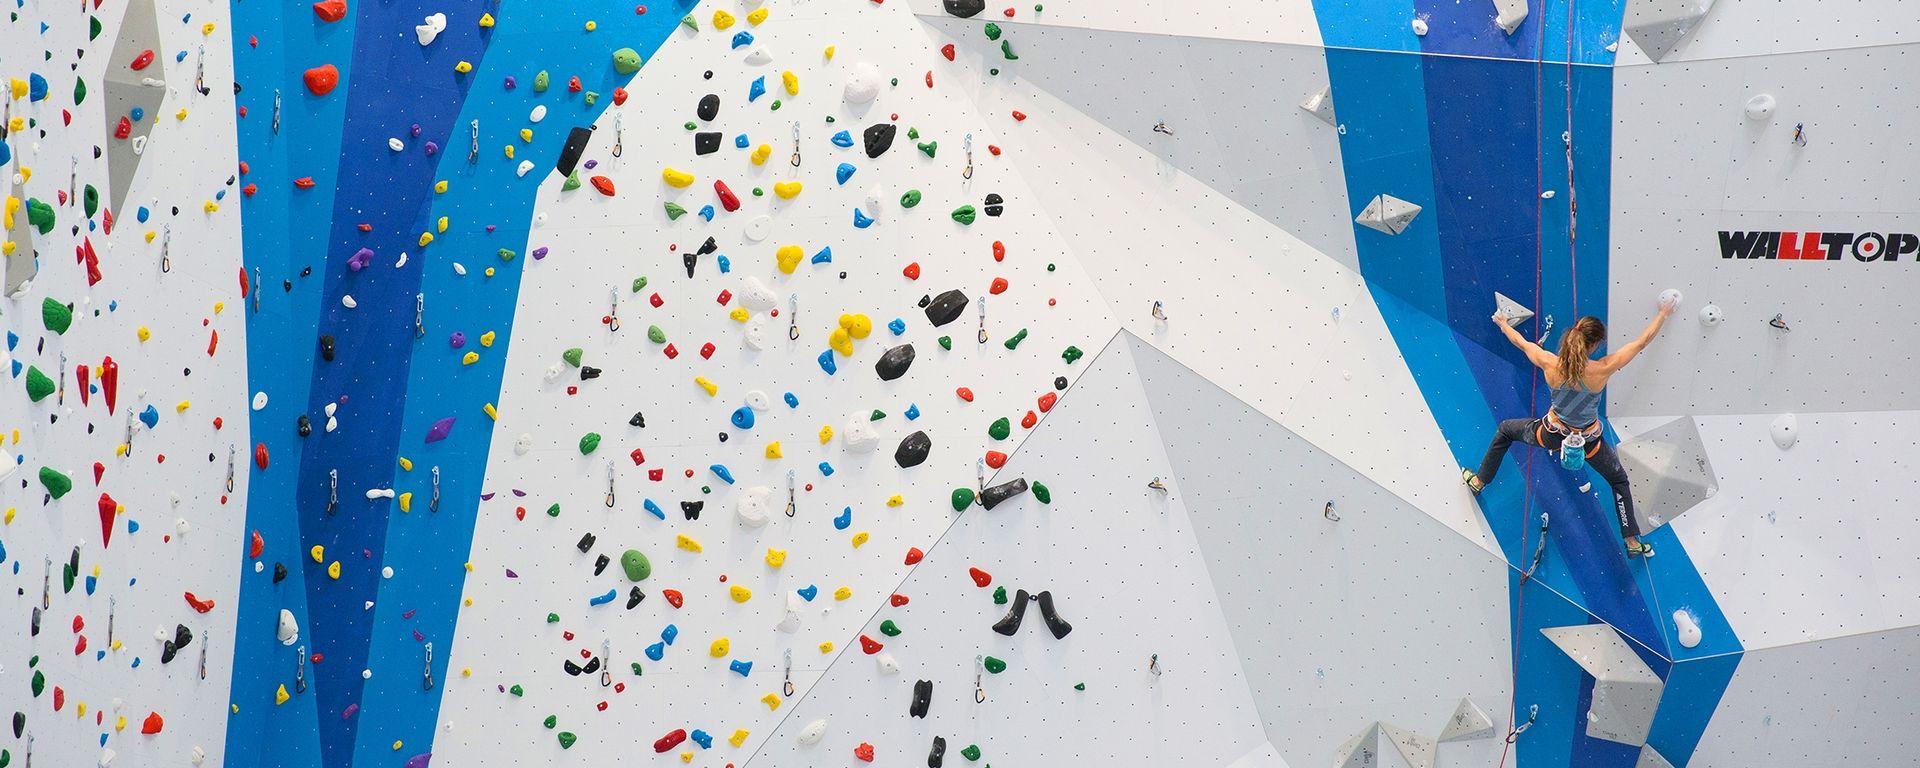 Test de Climb Up à Mérignac